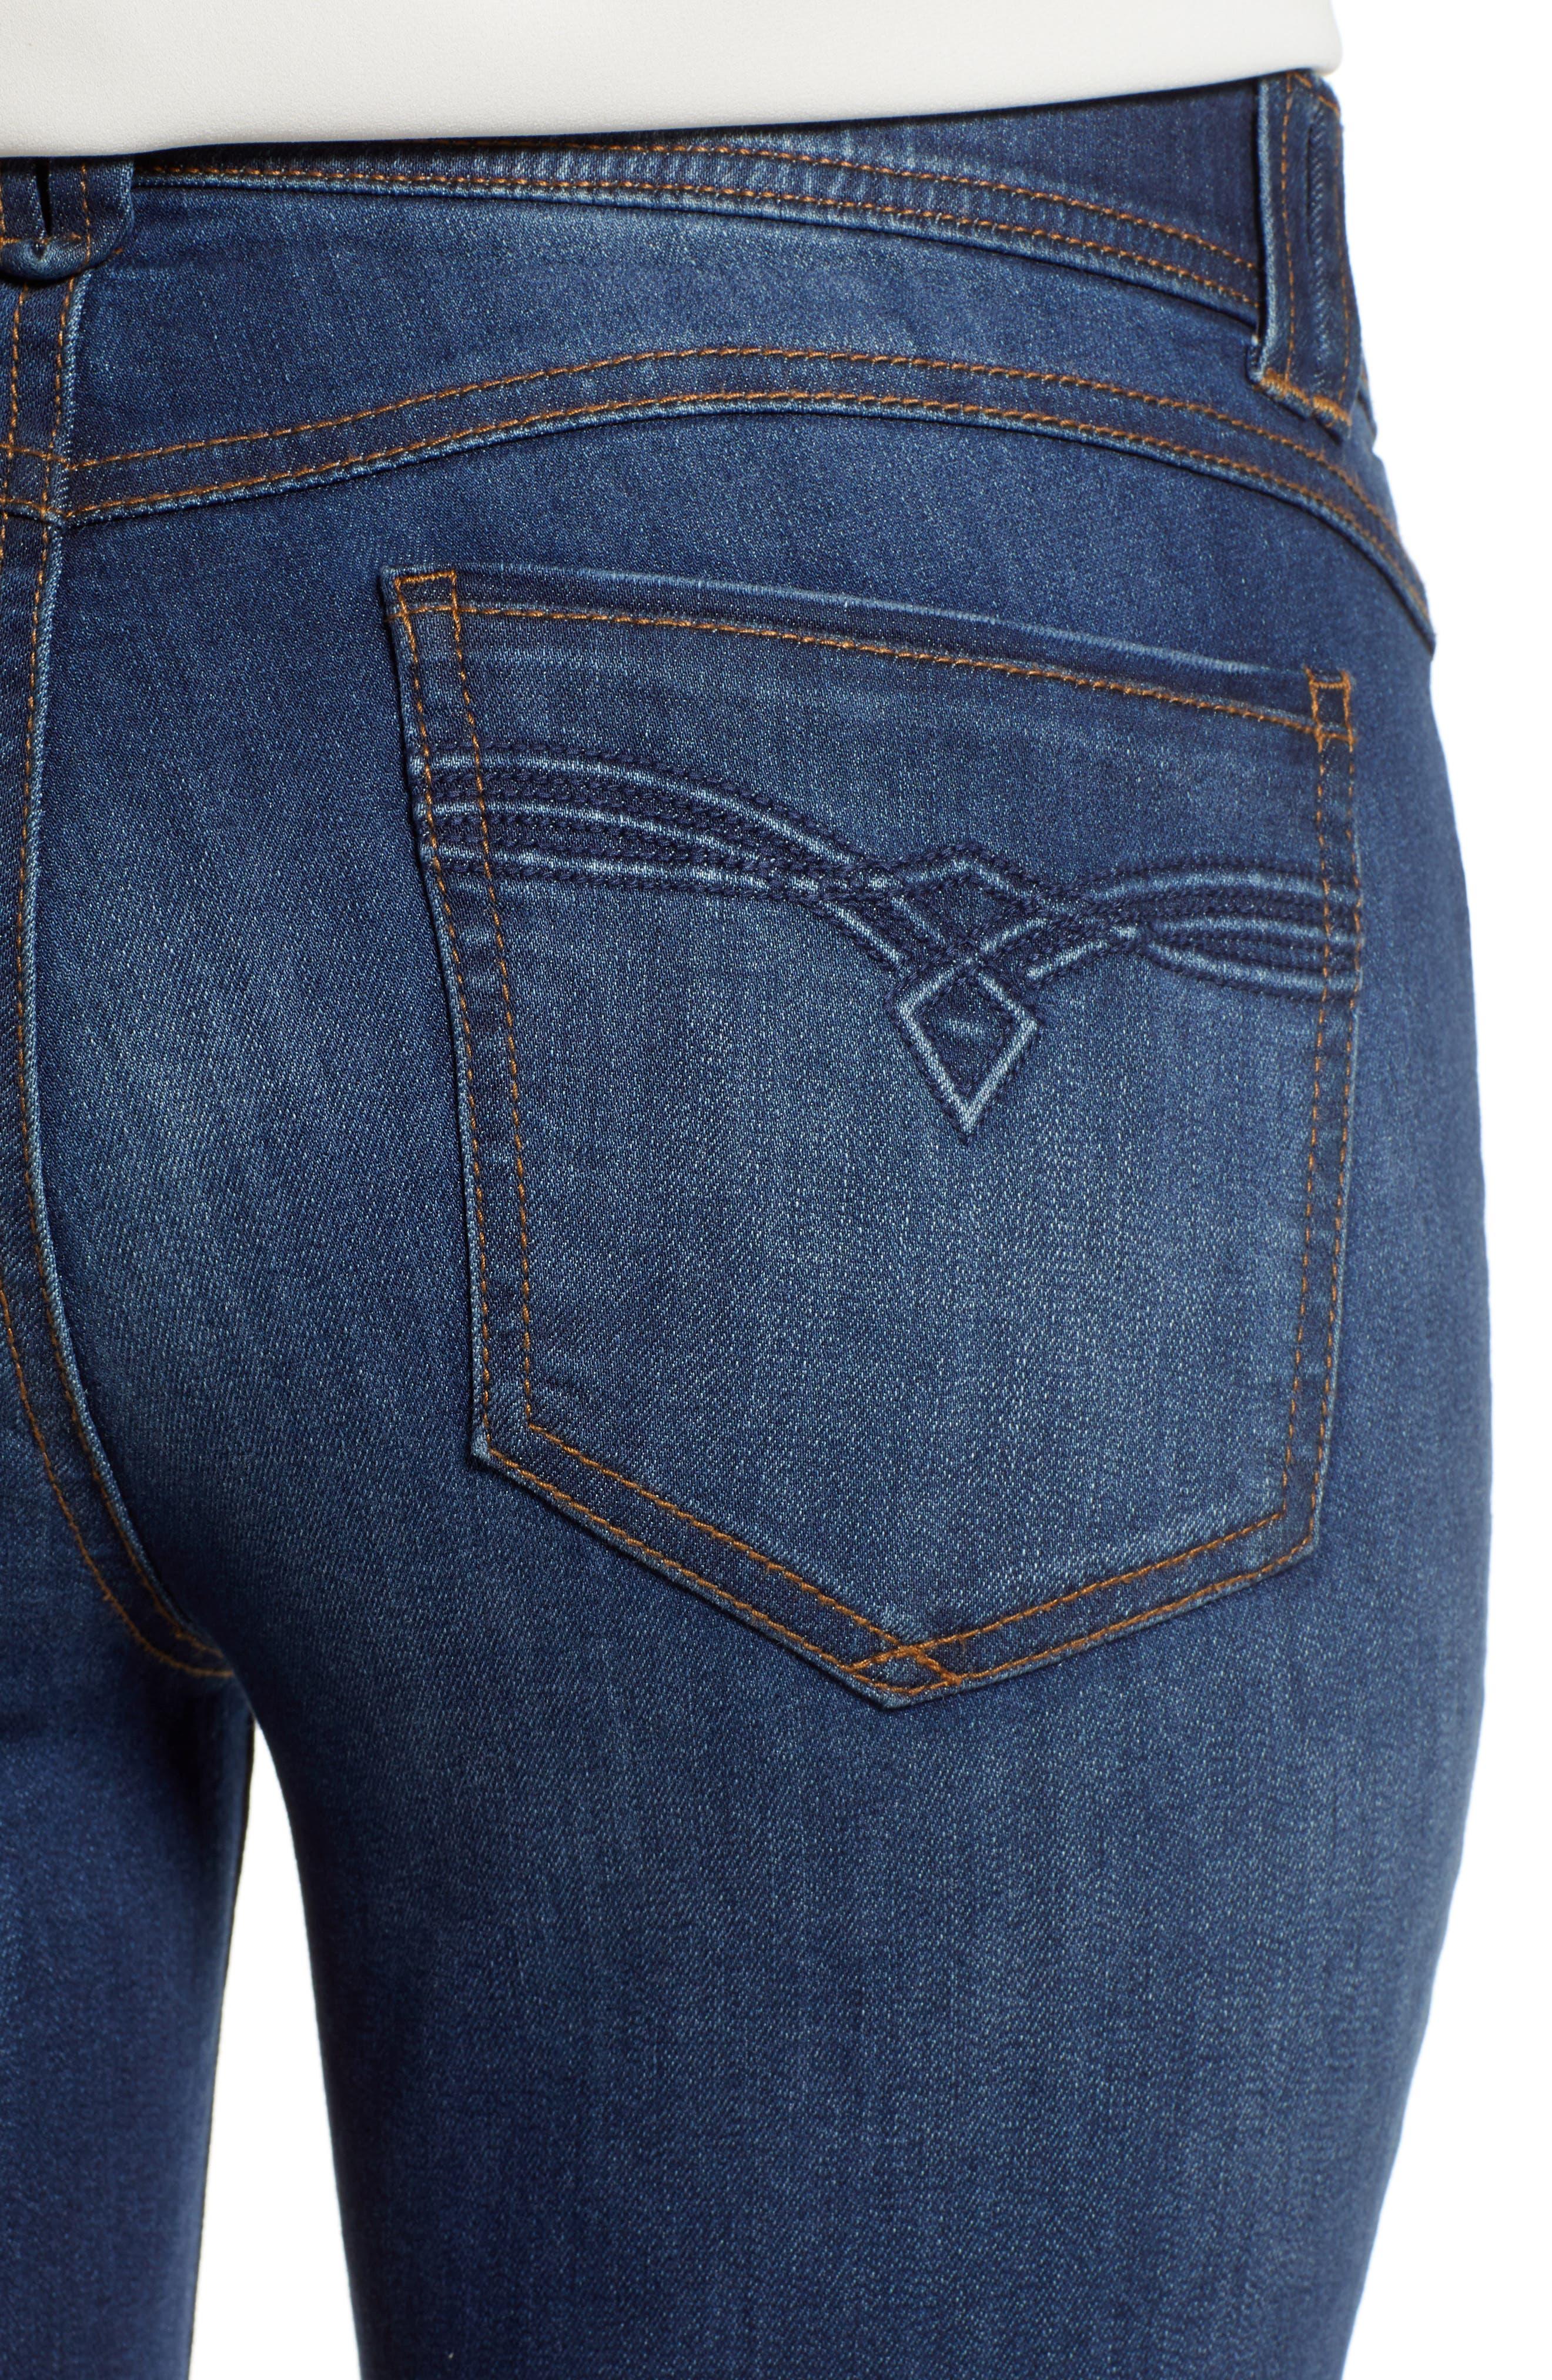 Ab-solution Luxe Touch Premium Jeans,                             Alternate thumbnail 4, color,                             420